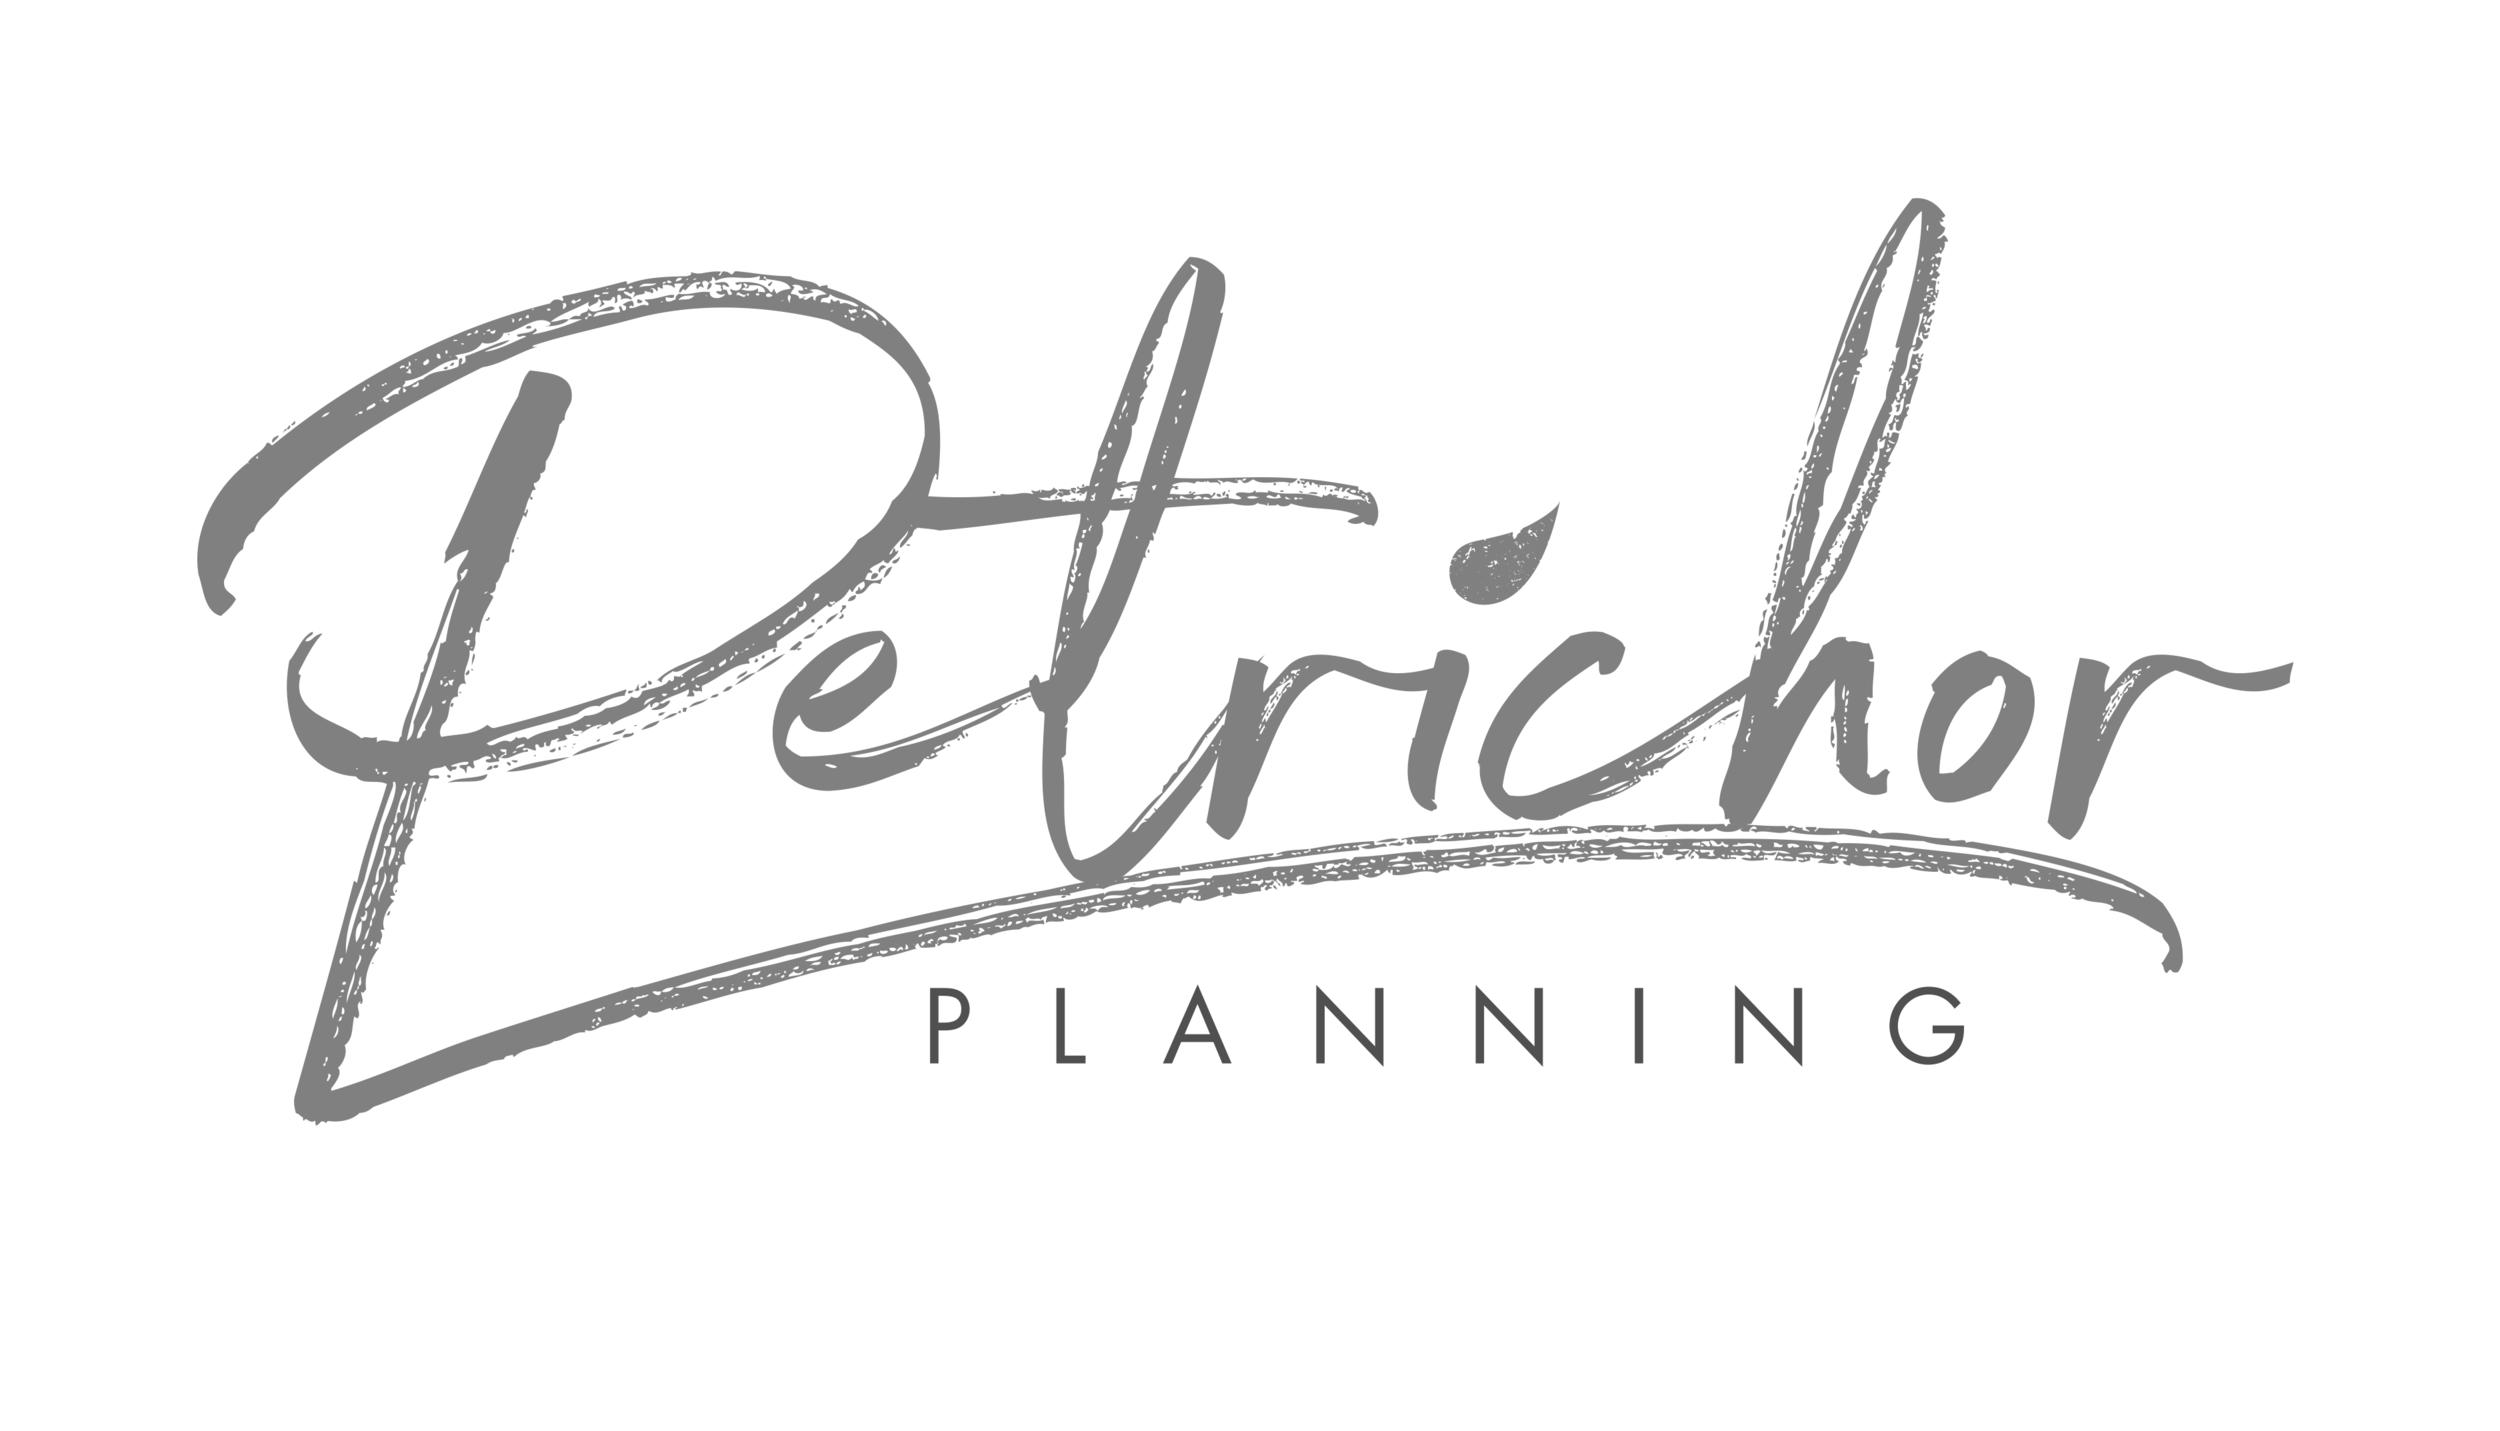 petrichorplanning_logo.png